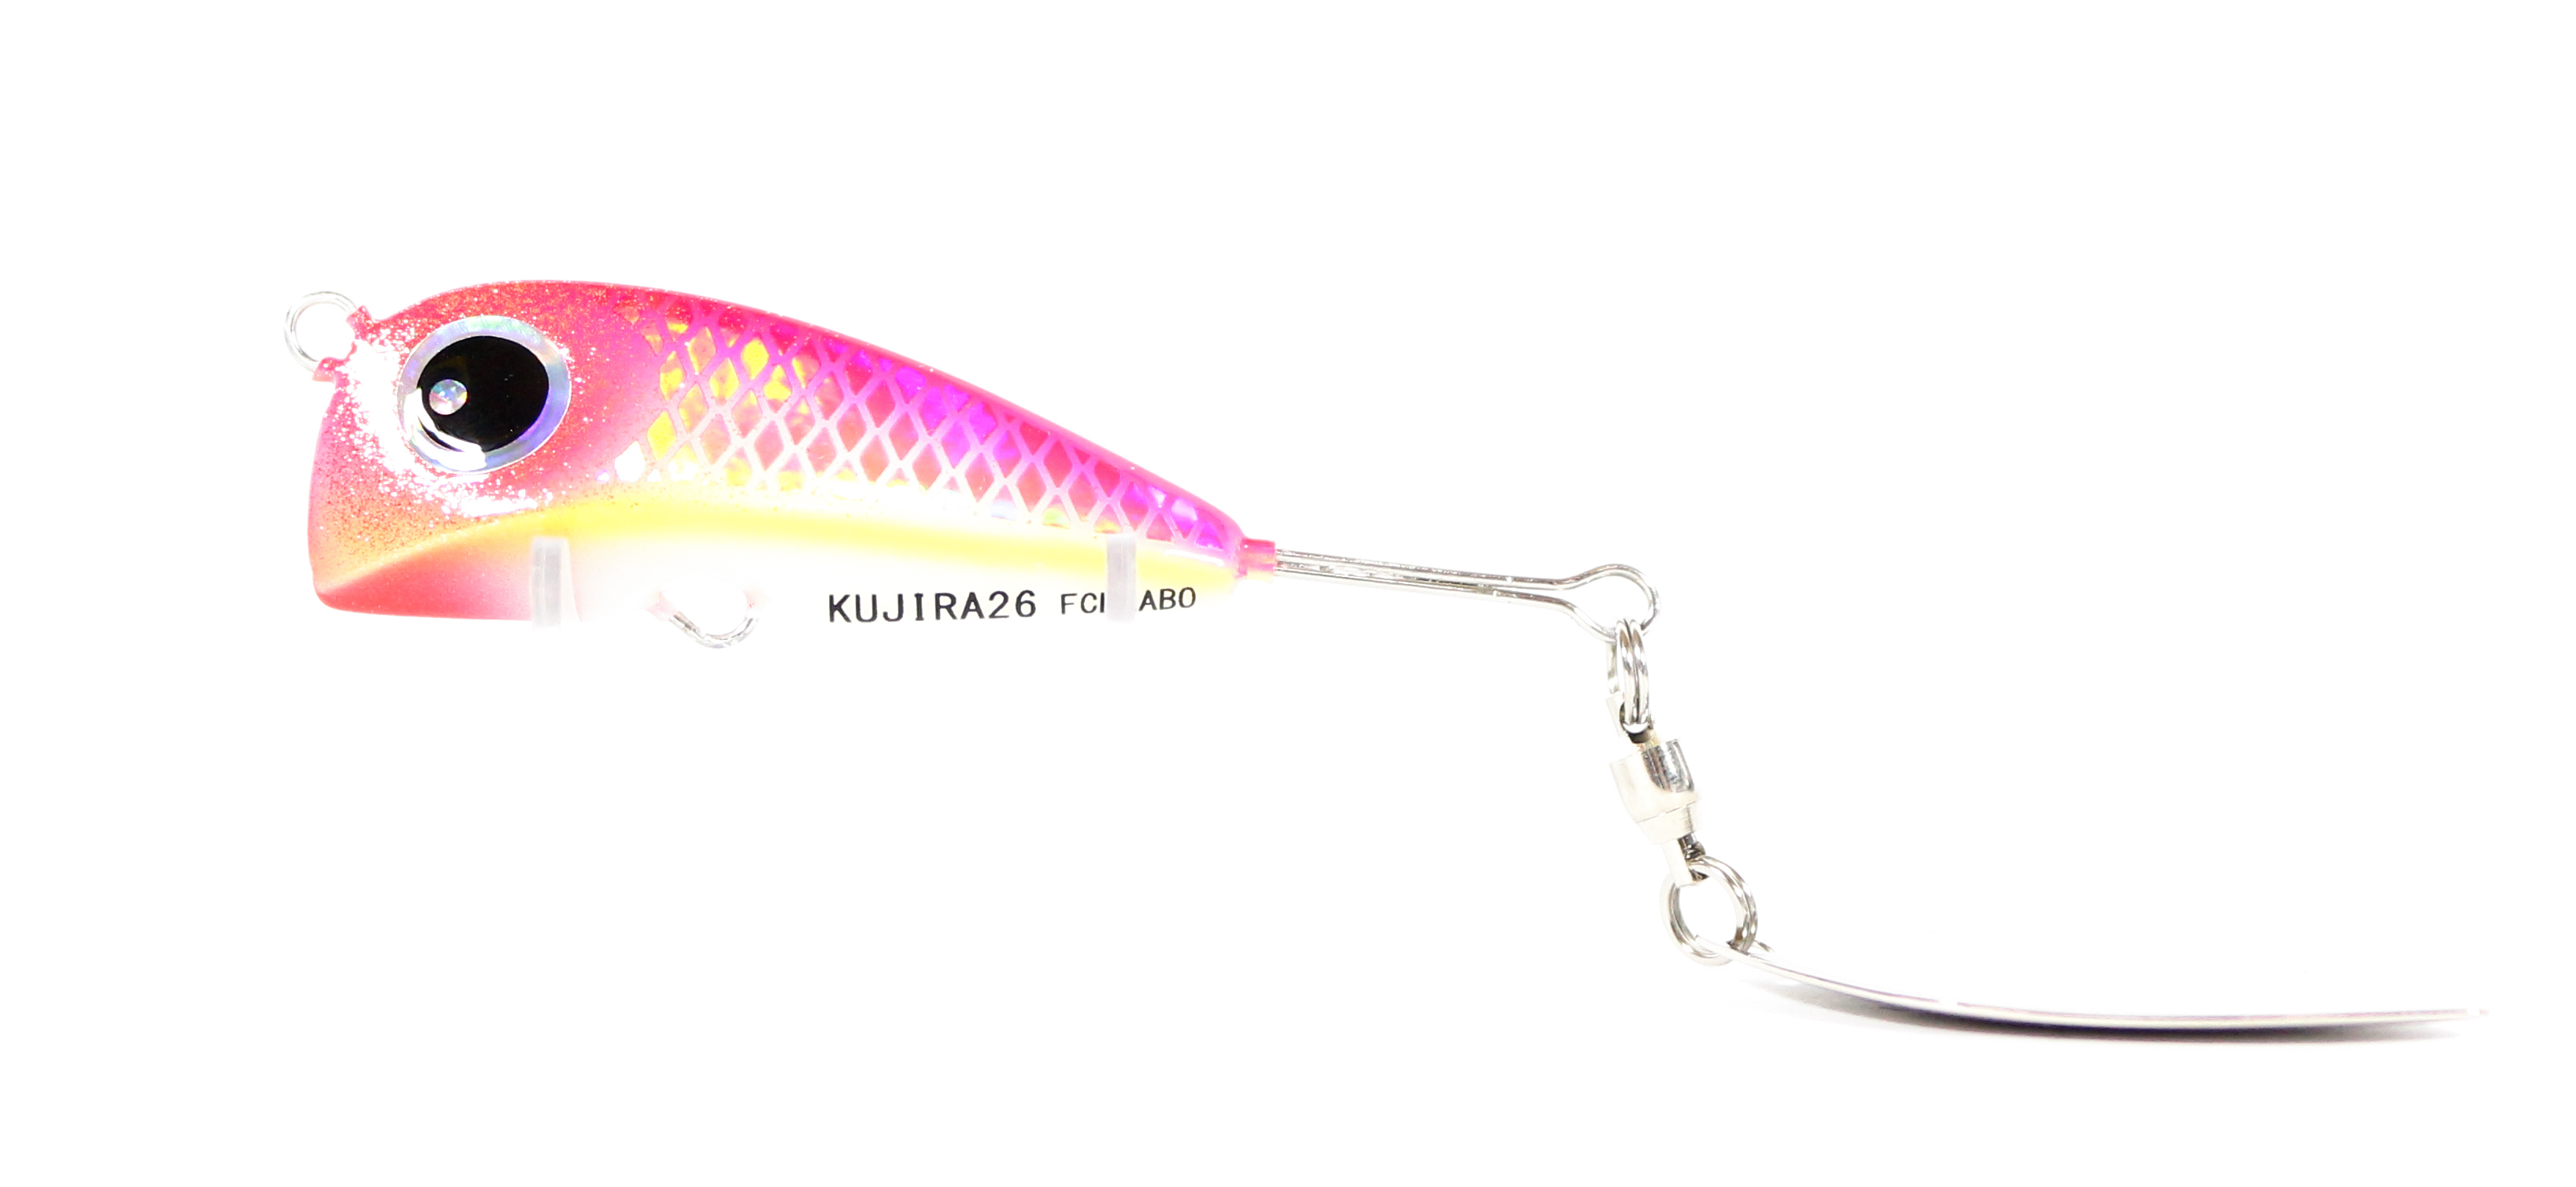 FCL Labo Spinner Tail Madai Jig Kujira 26 Grams Sinking Lure Pink (1093)